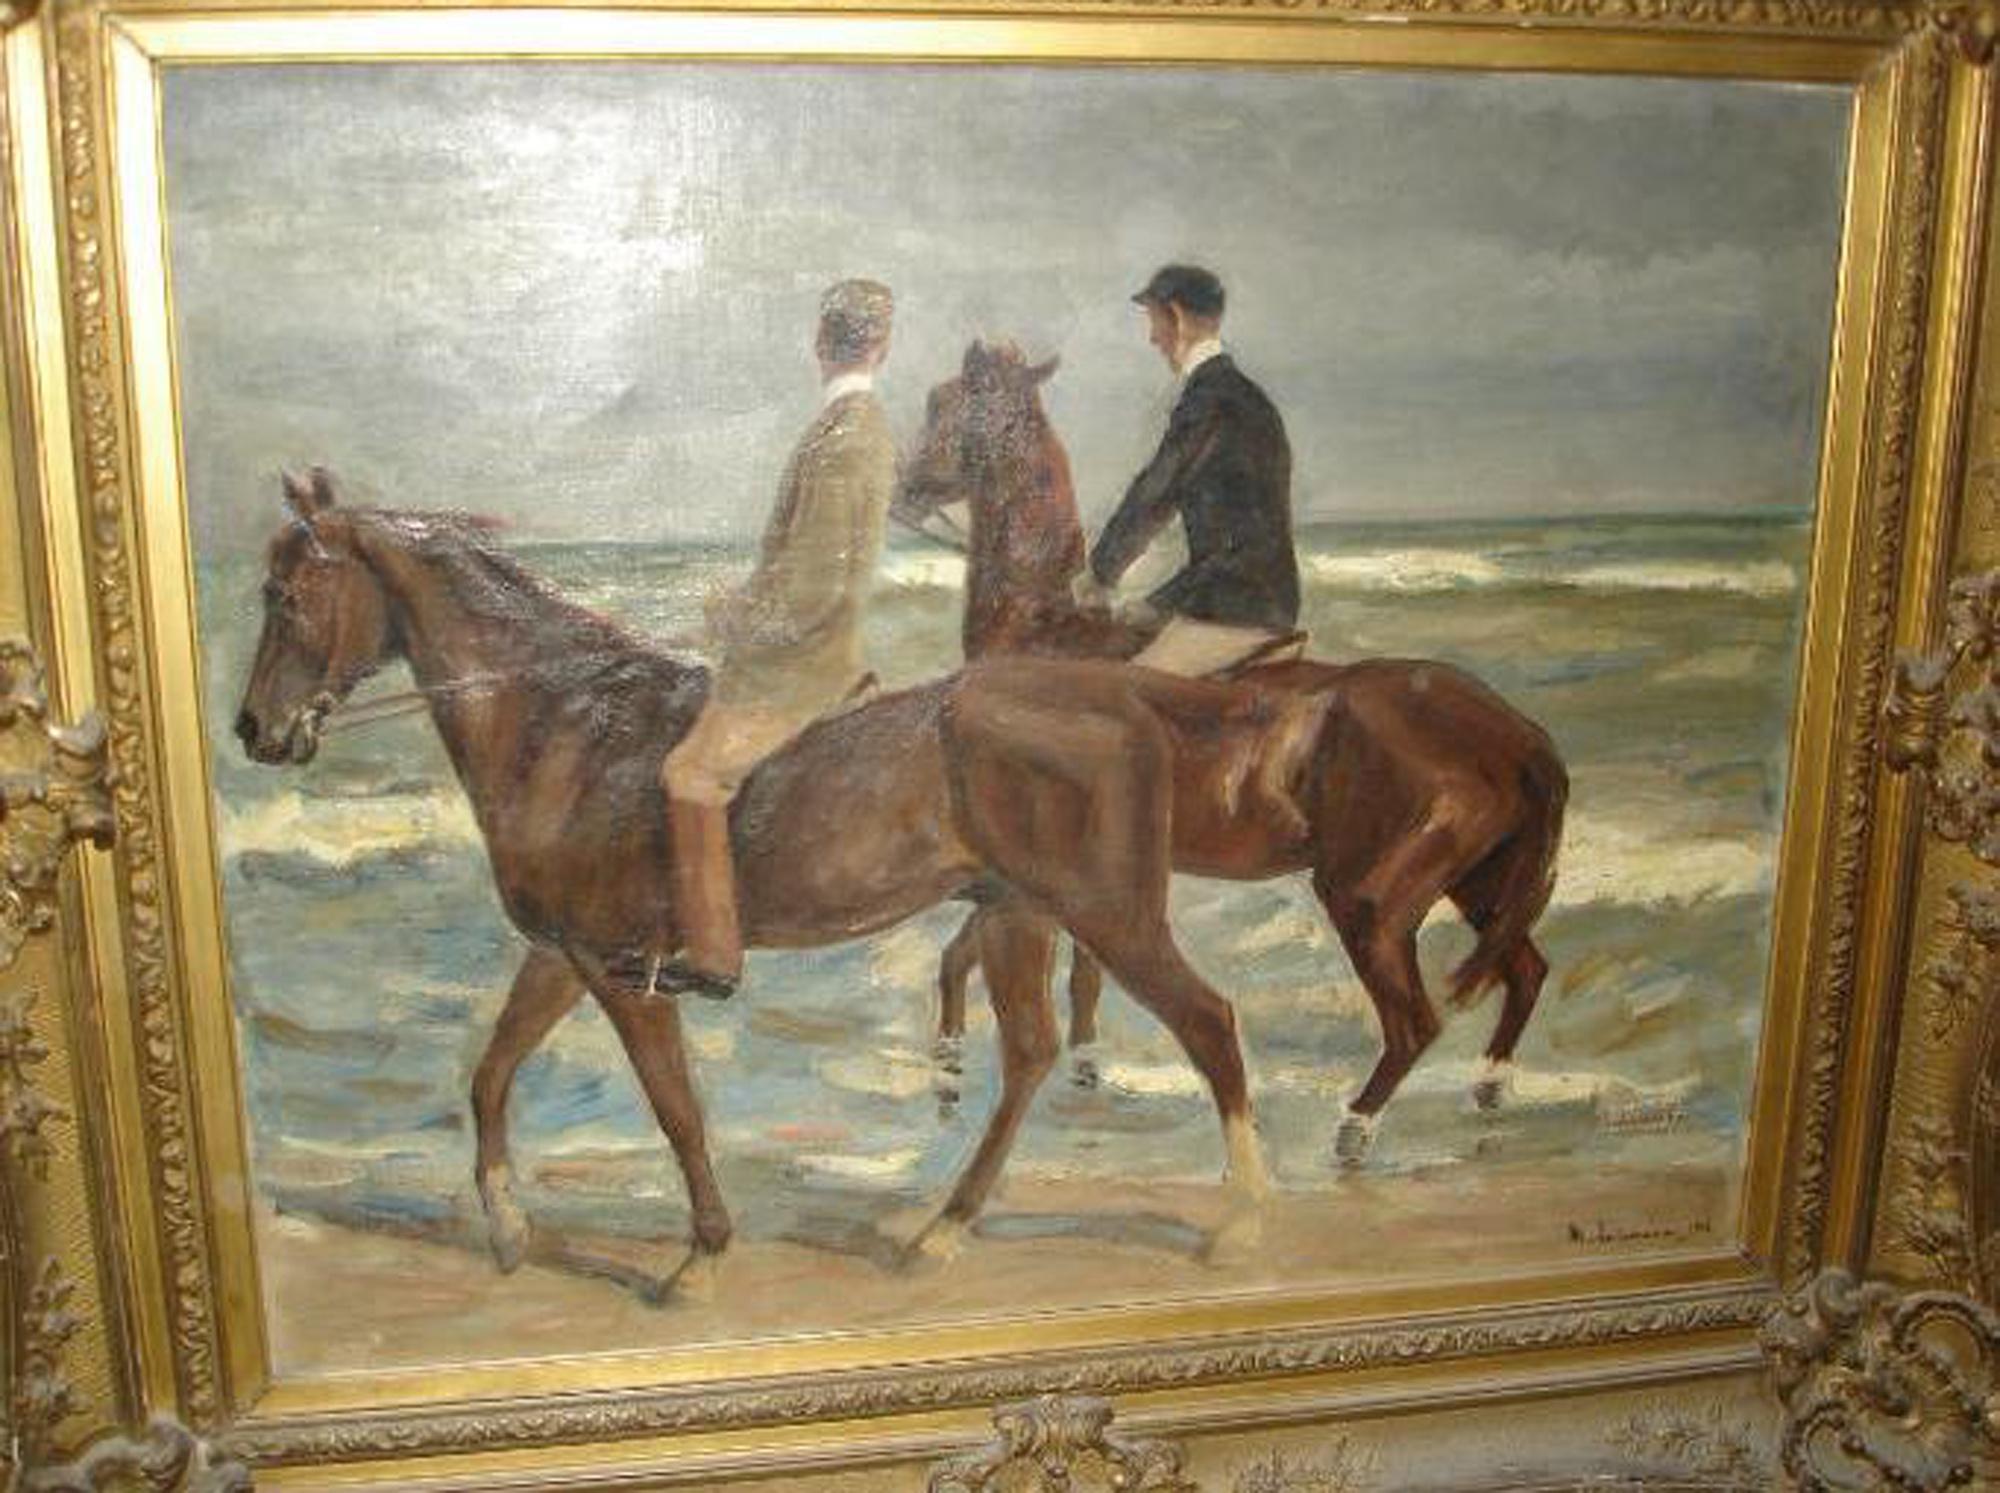 berlin report german collector hid art out of love